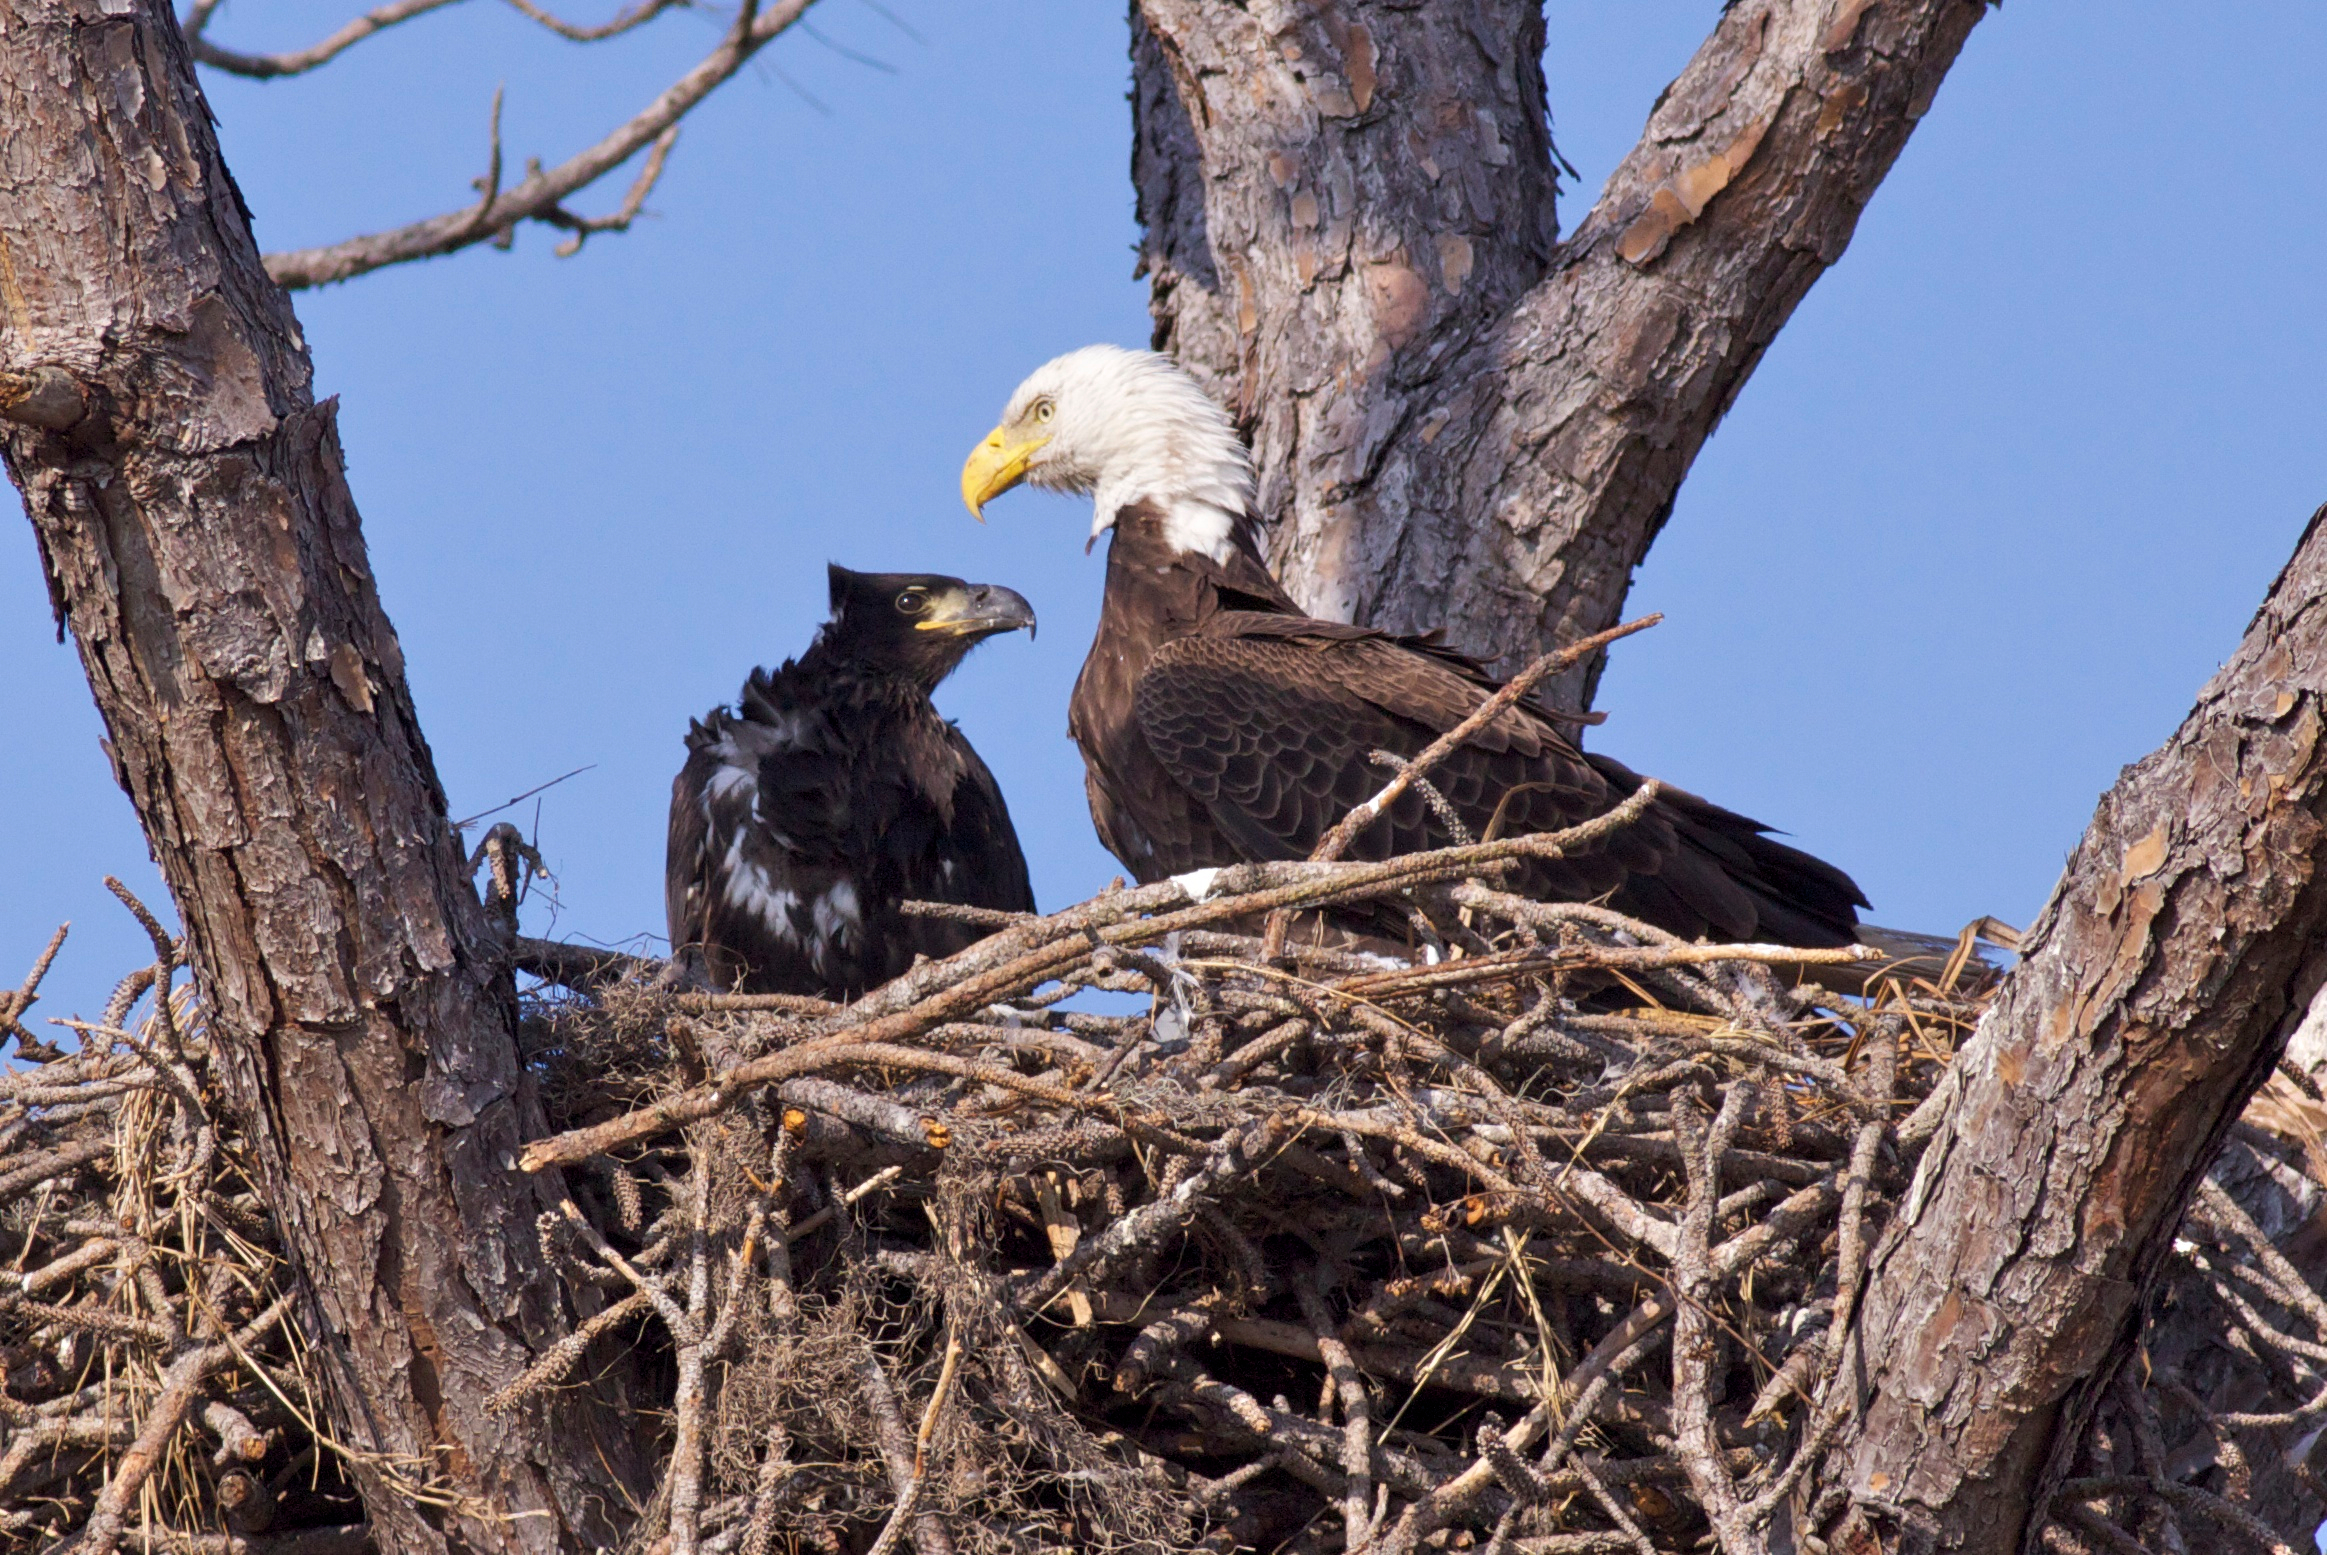 Bald eagle family photo by Arlene Koziol